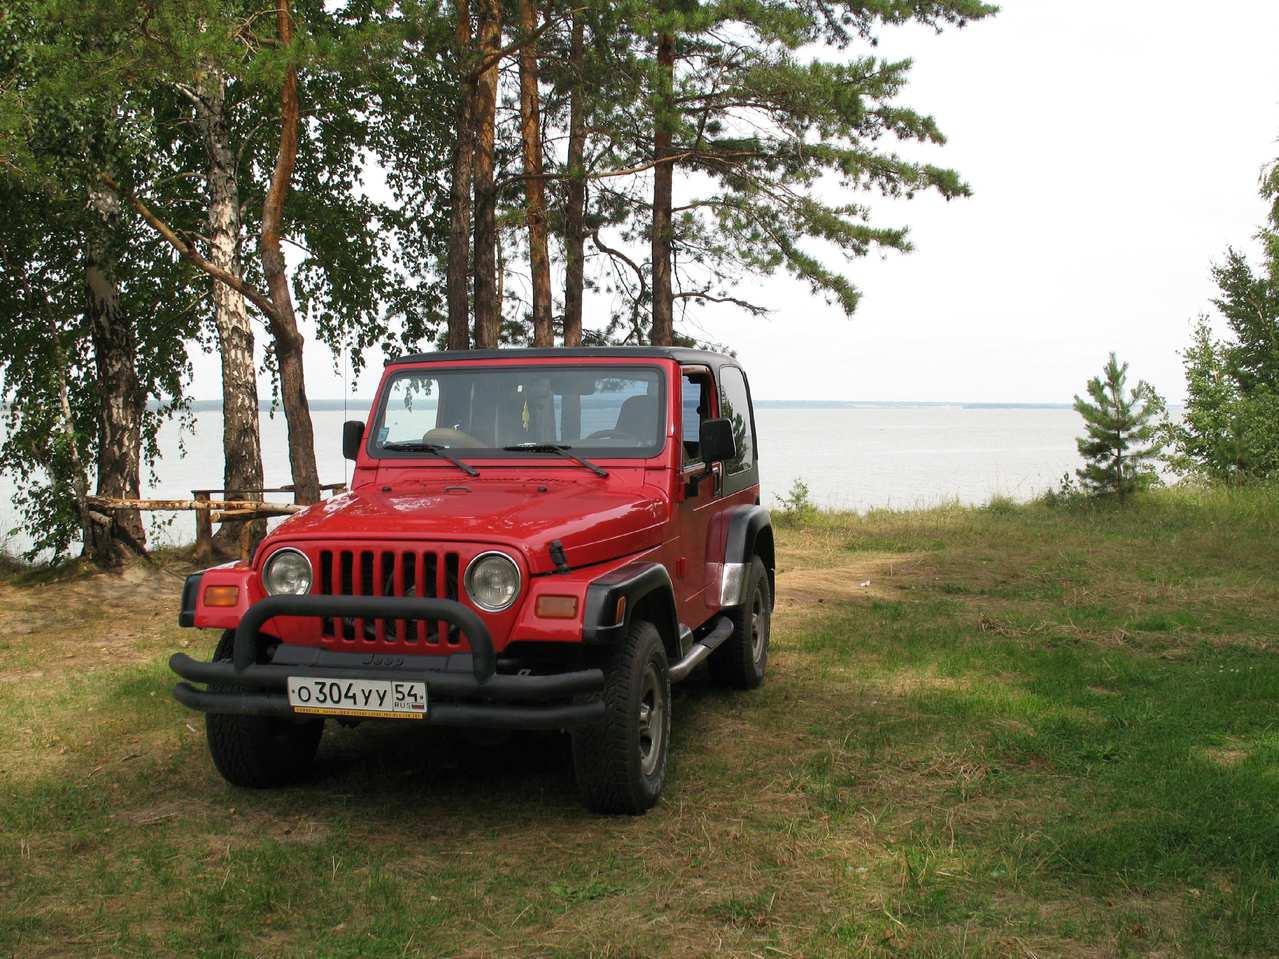 1996 jeep wrangler photos 4 0 gasoline automatic for sale. Black Bedroom Furniture Sets. Home Design Ideas